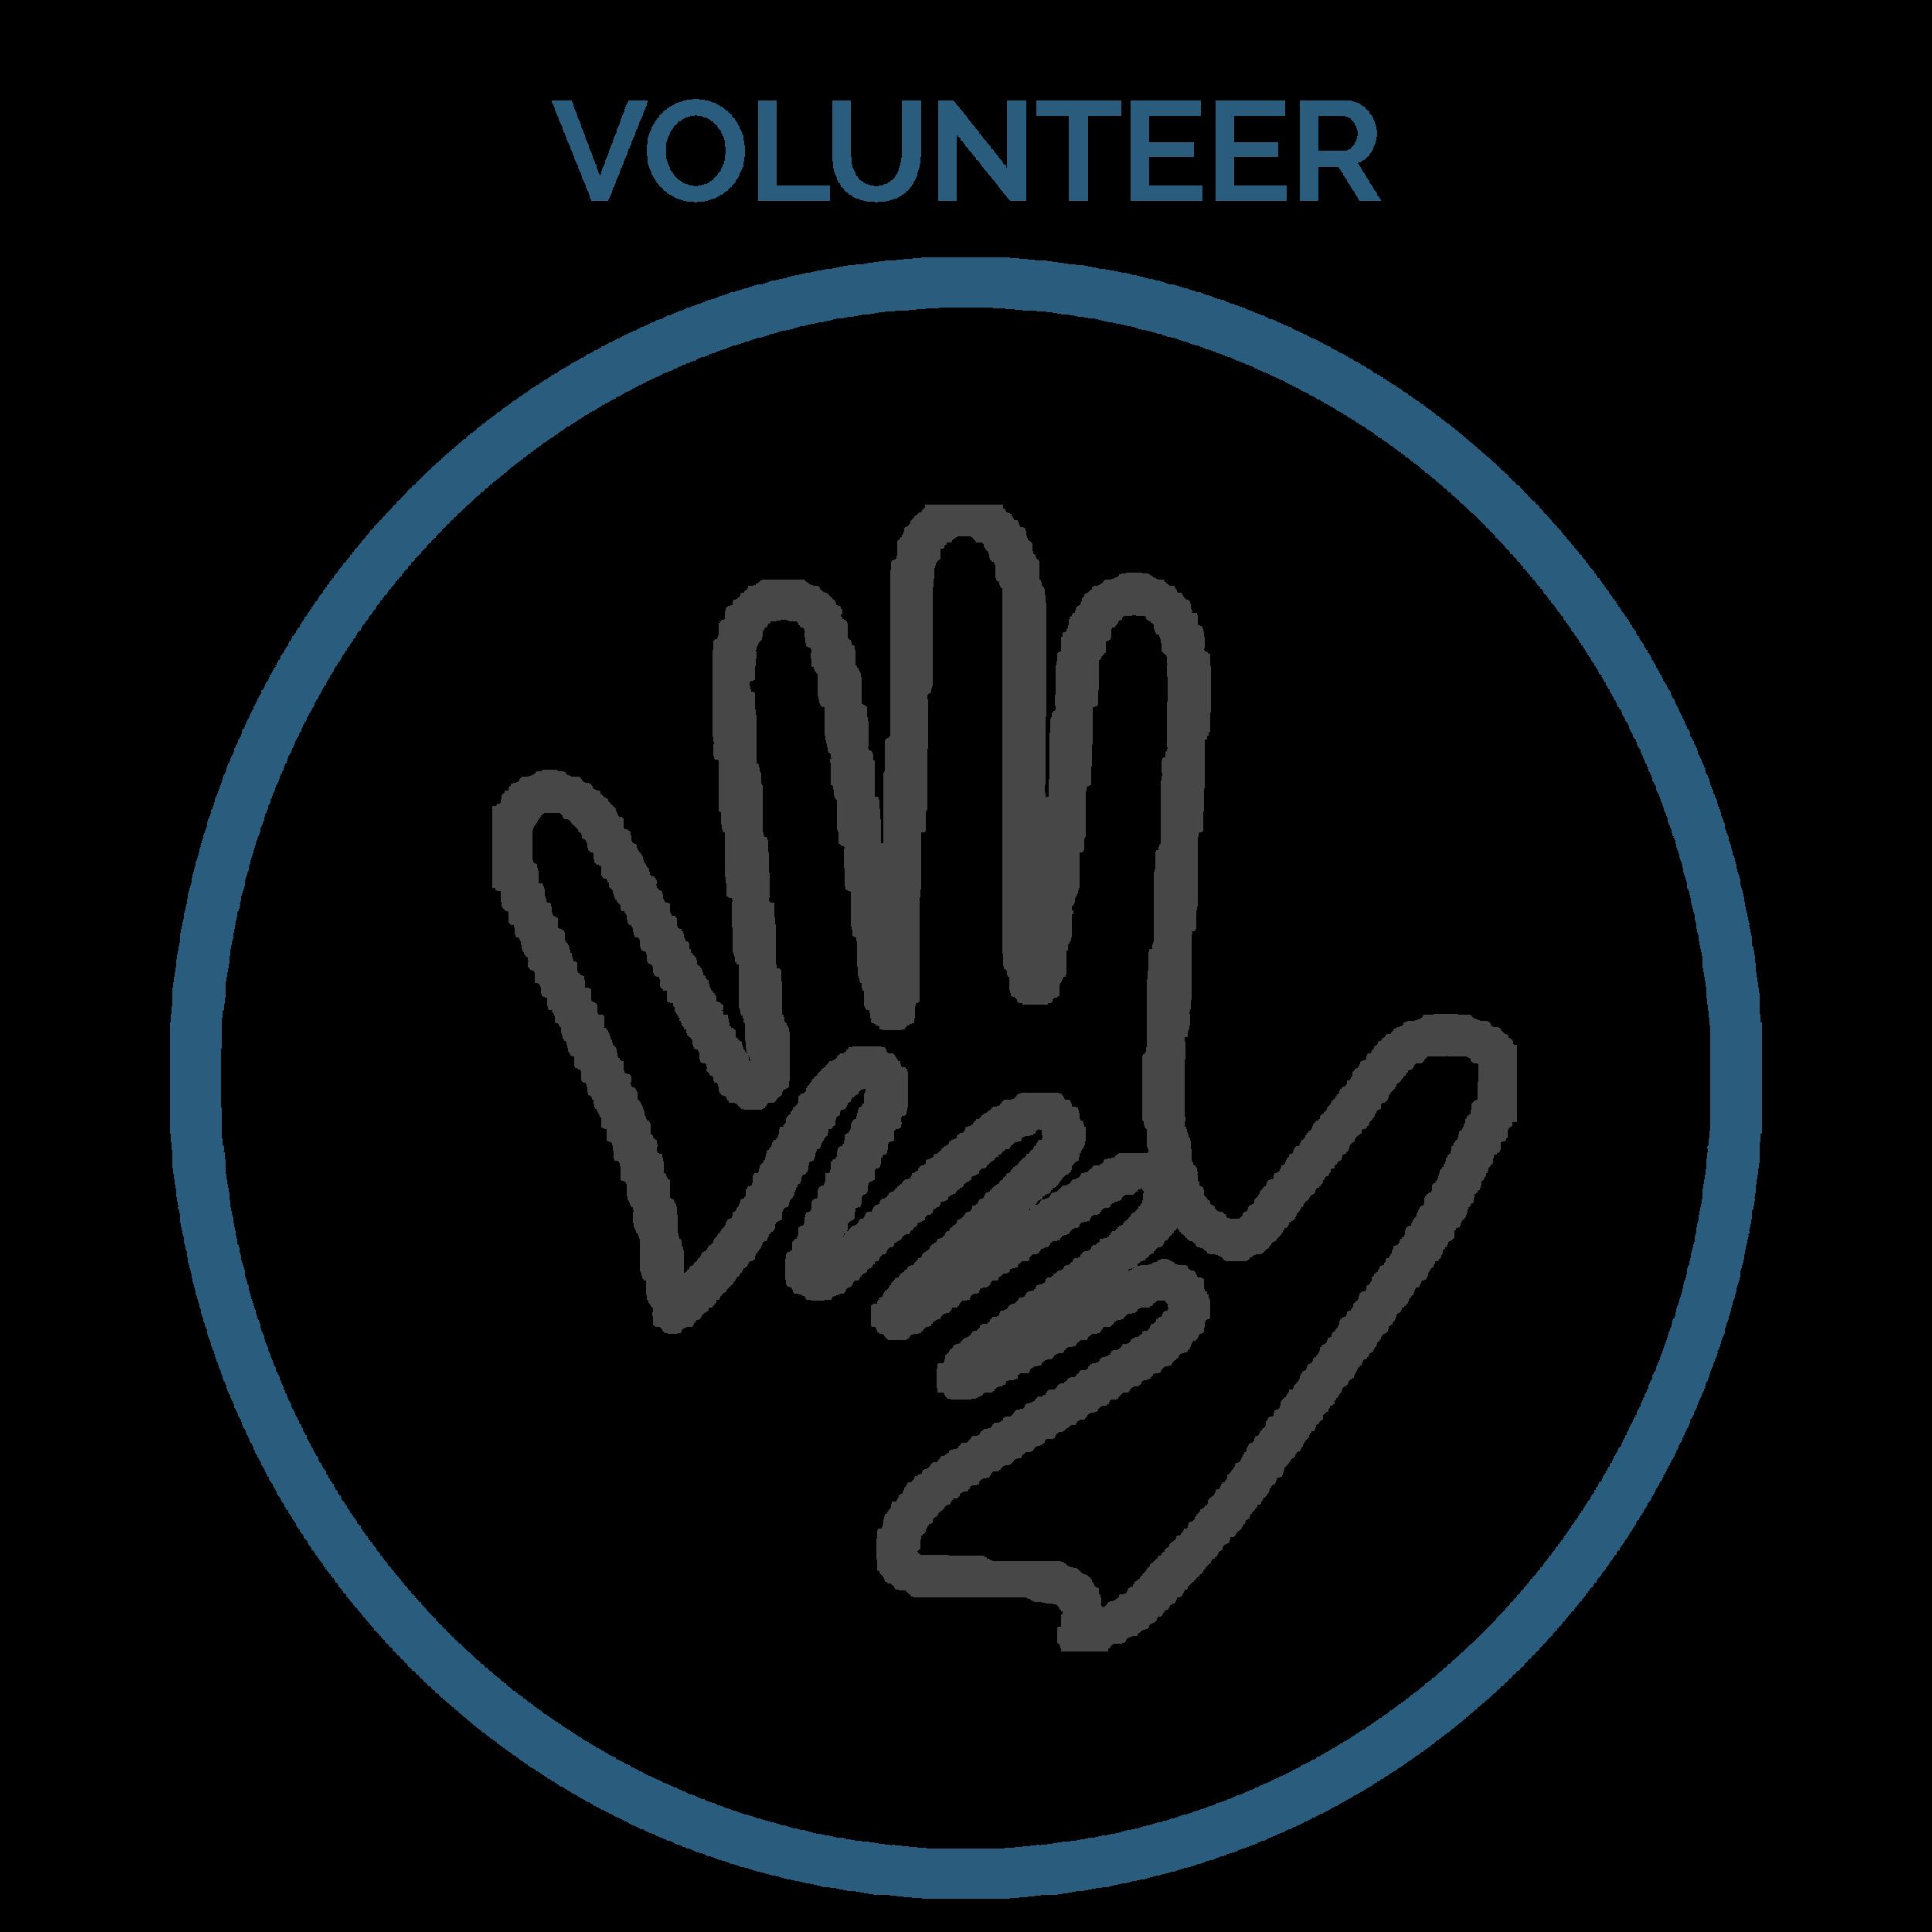 Volunteer WIN.png